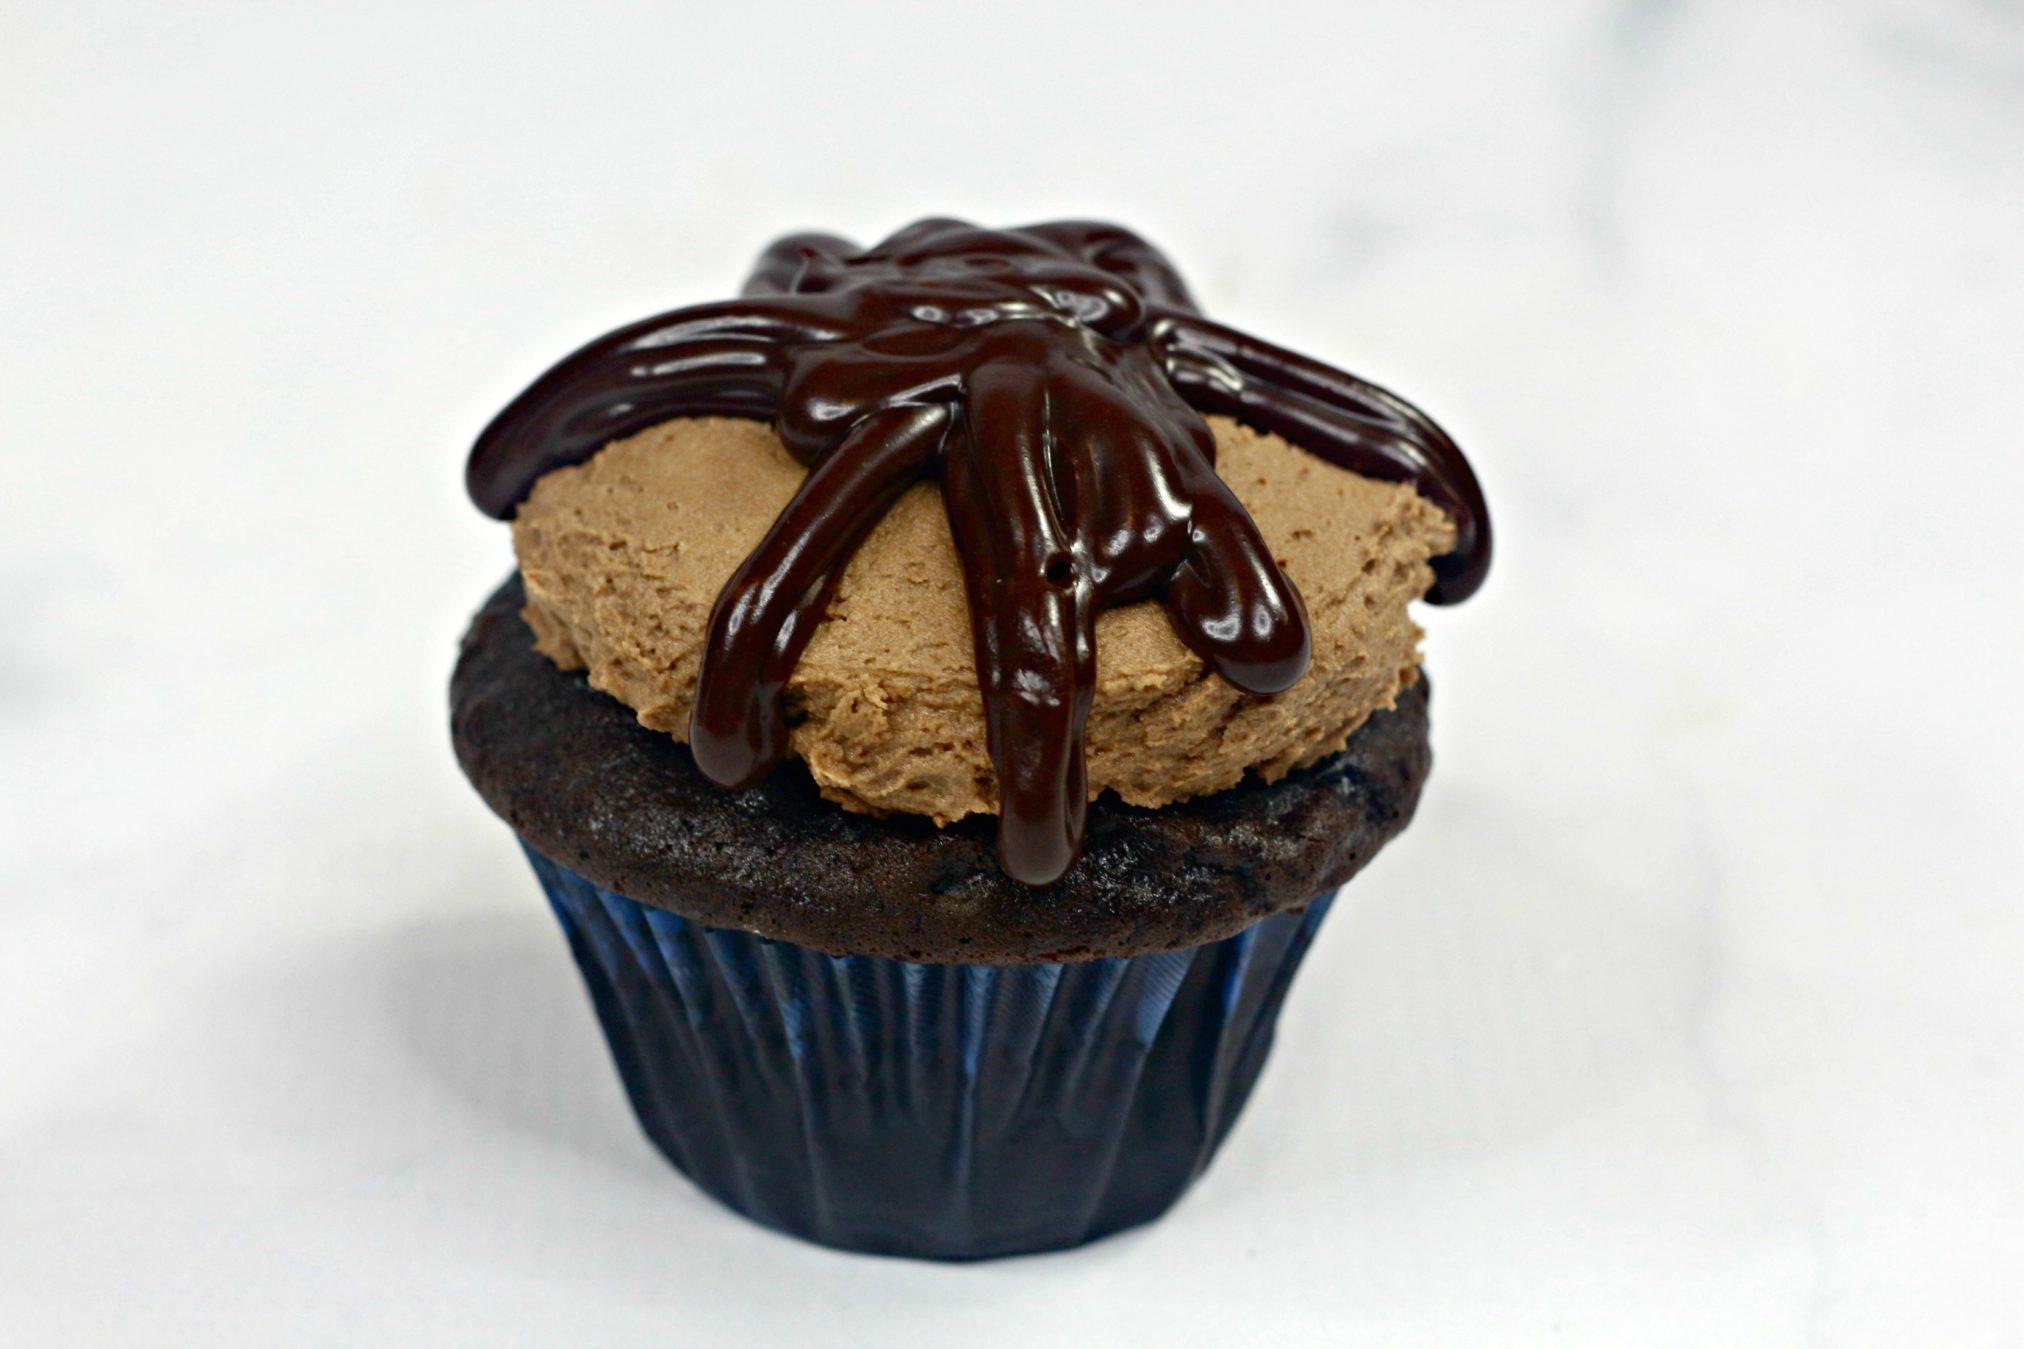 Chocolate Lovers Cupcake process